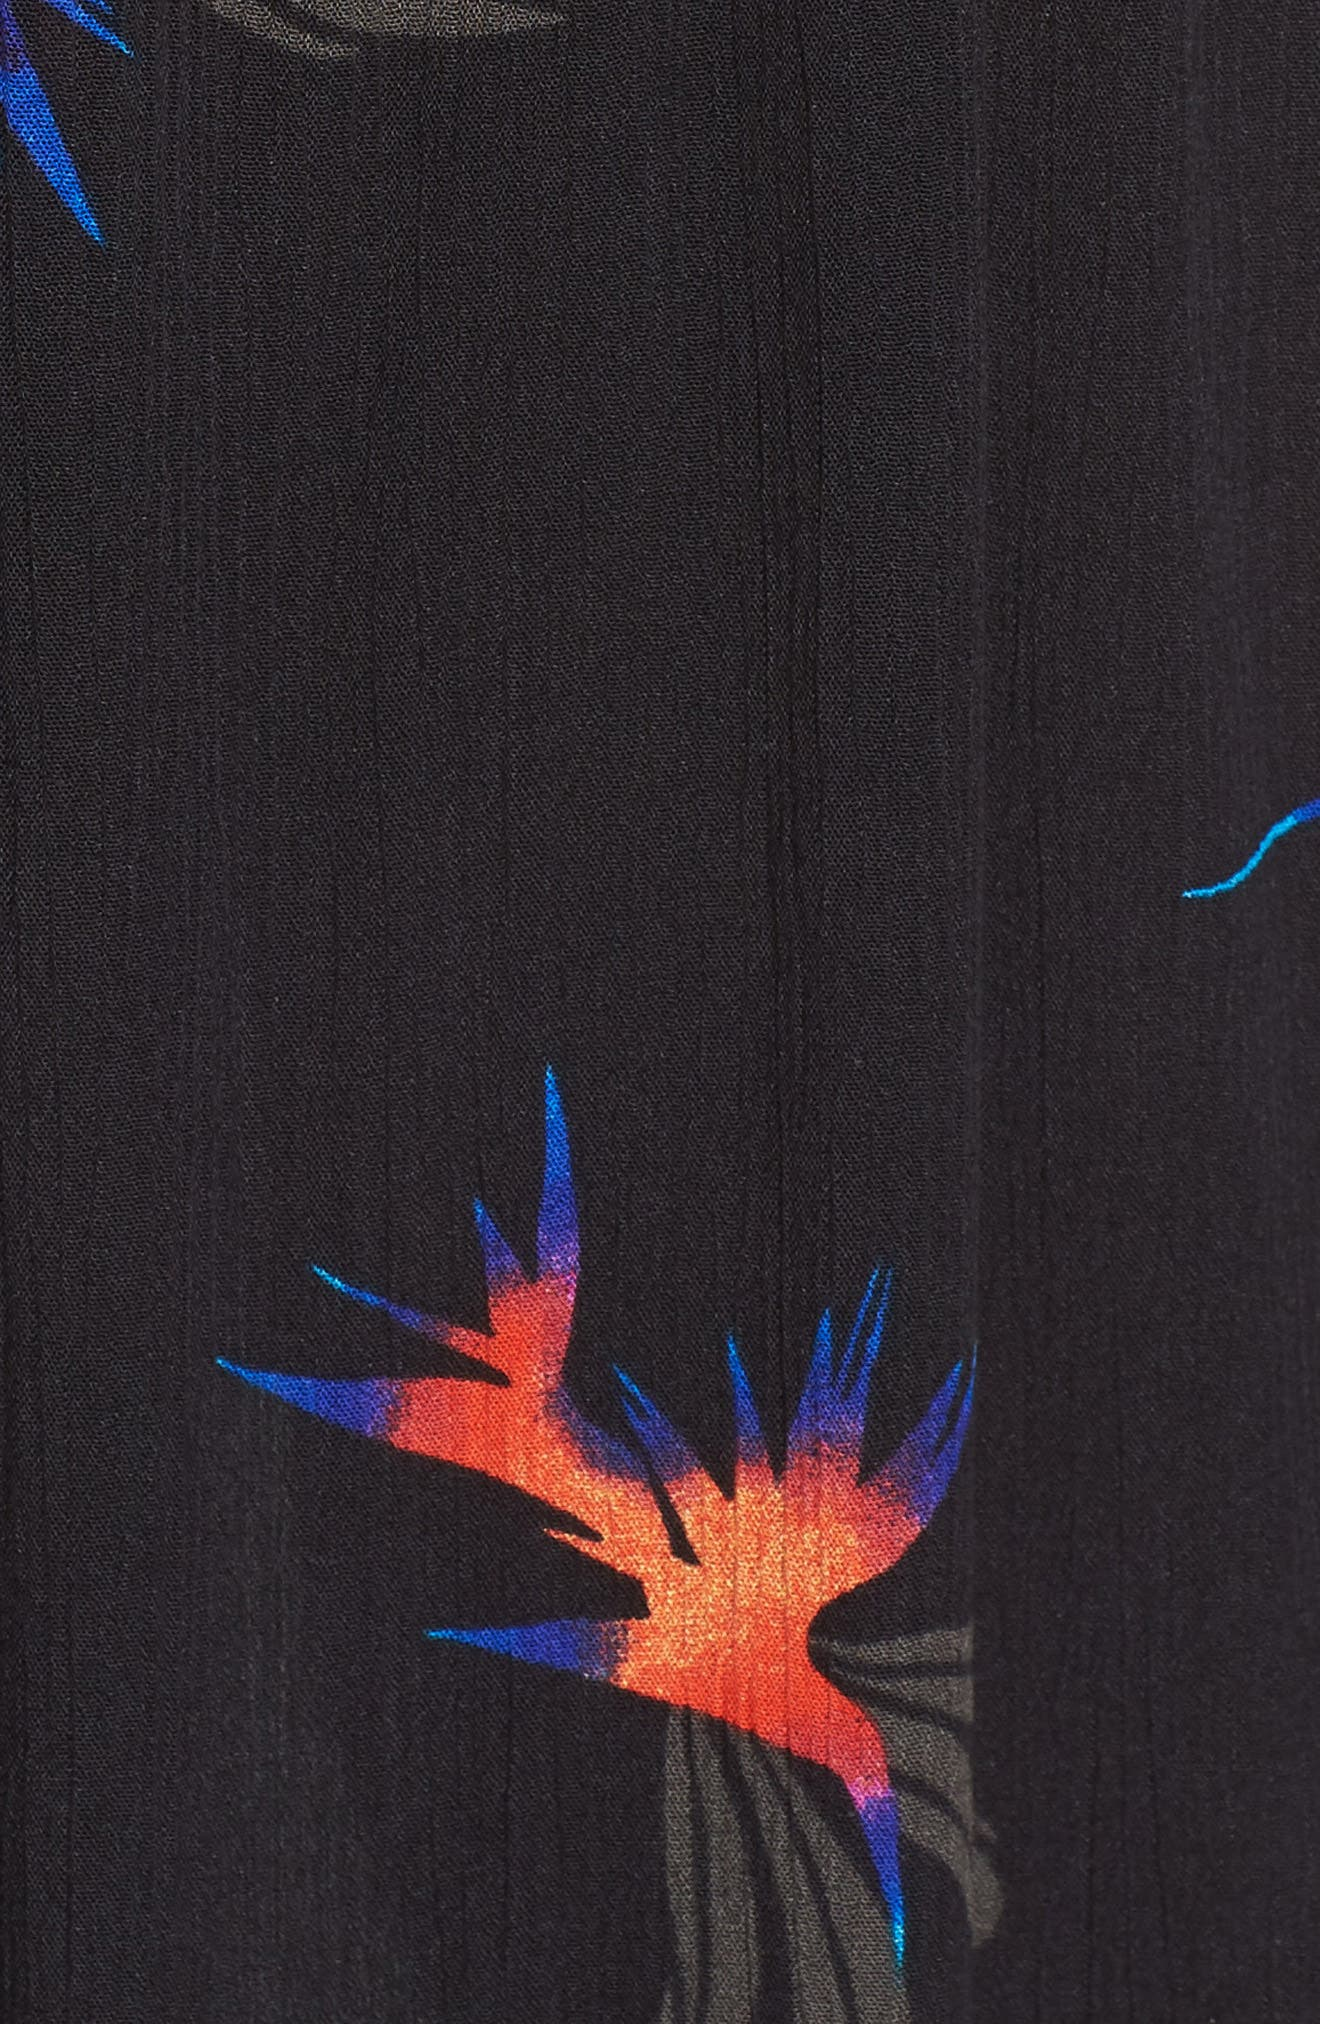 Sydney Midi Dress,                             Alternate thumbnail 6, color,                             Black Paradise City Print